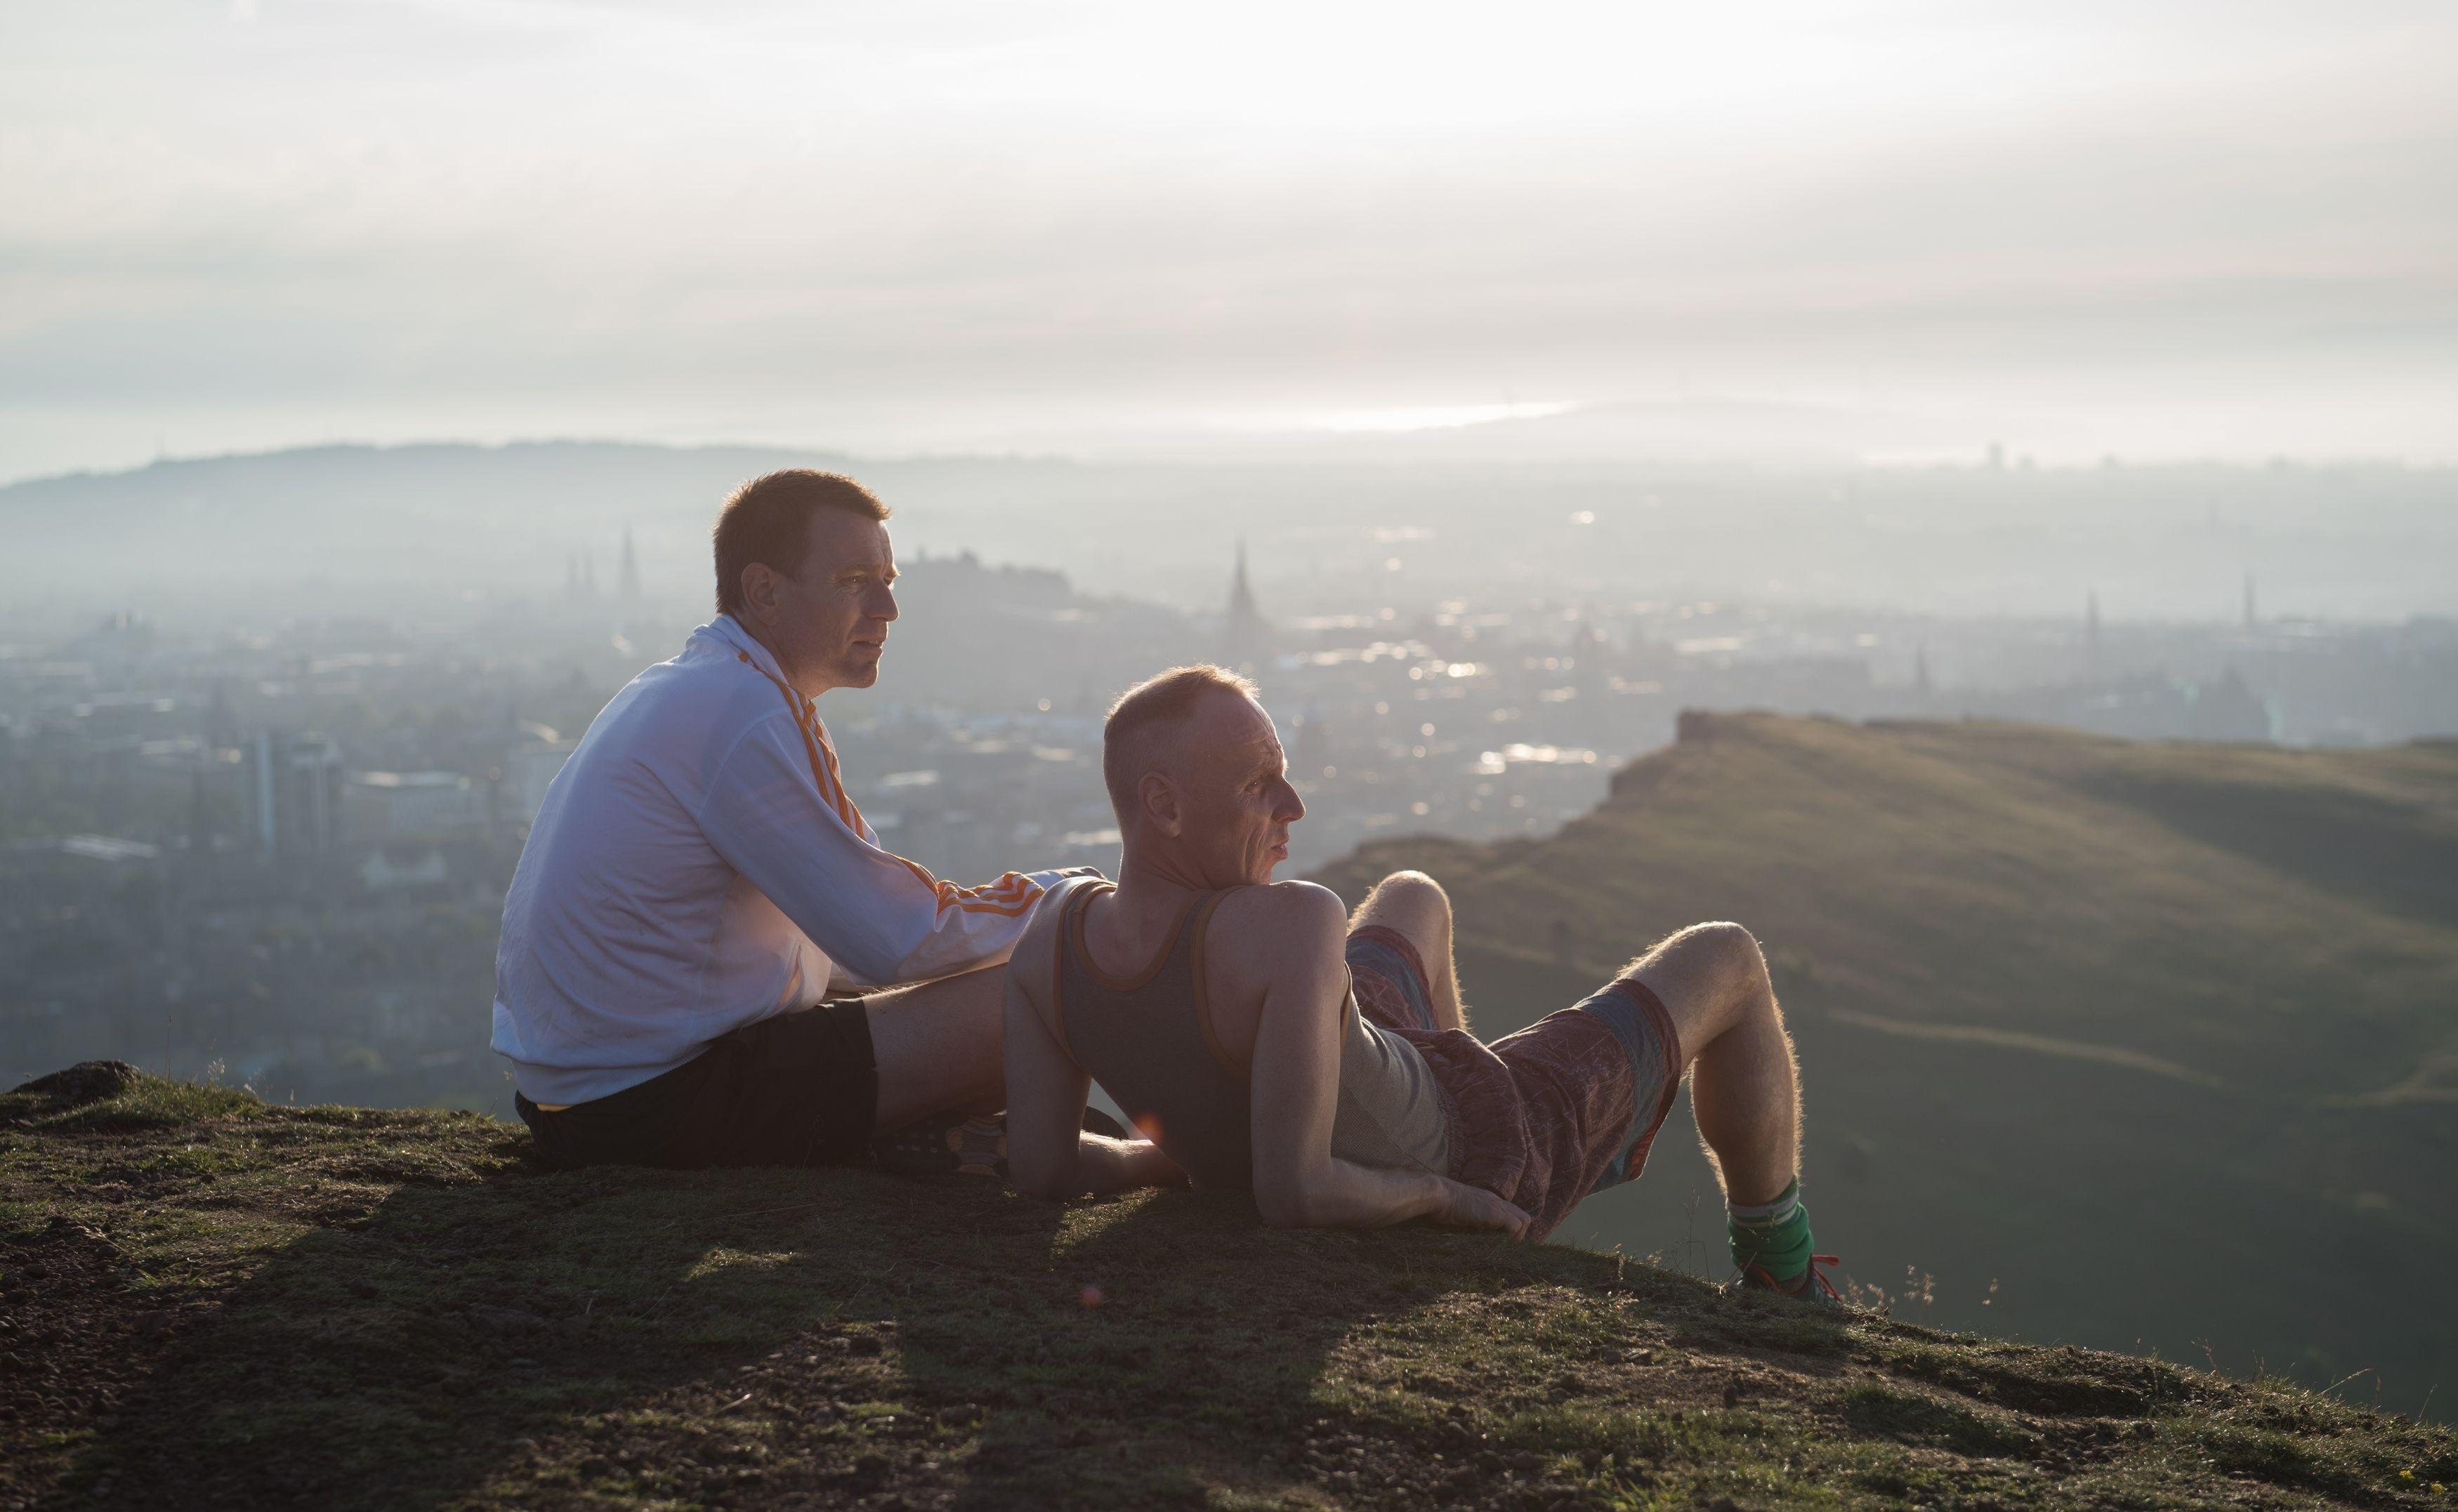 Pictured: Ewan McGregor as Mark 'Rent Boy' Renton and Ewen Bremner as Daniel 'Spud' Murphy.